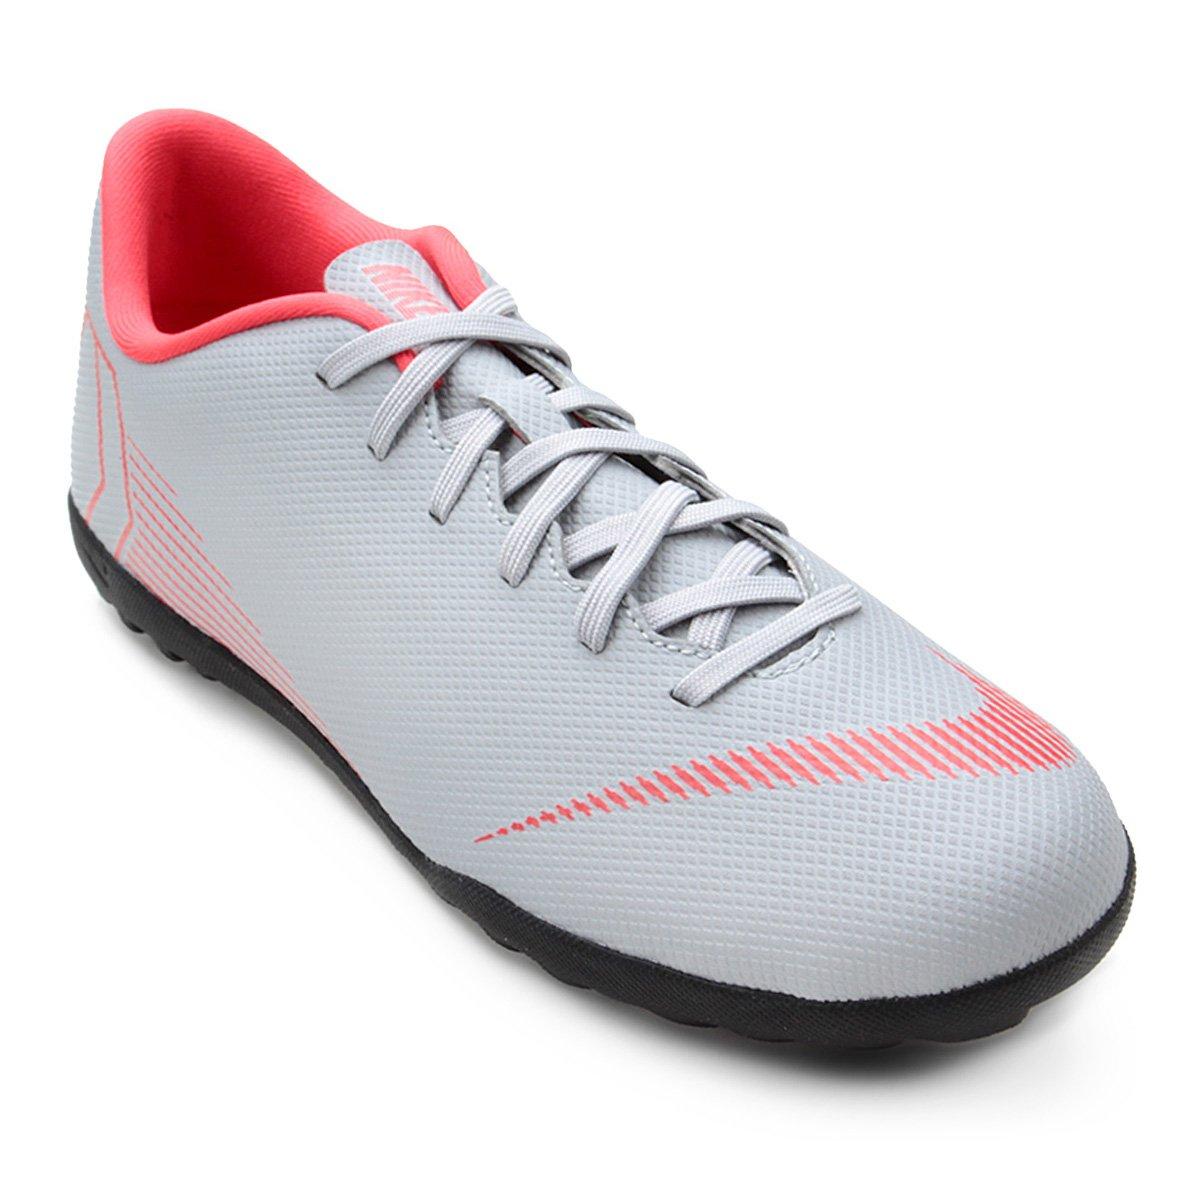 5fc6256da4 Chuteira Society Nike Mercurial Vapor 12 Club - Cinza